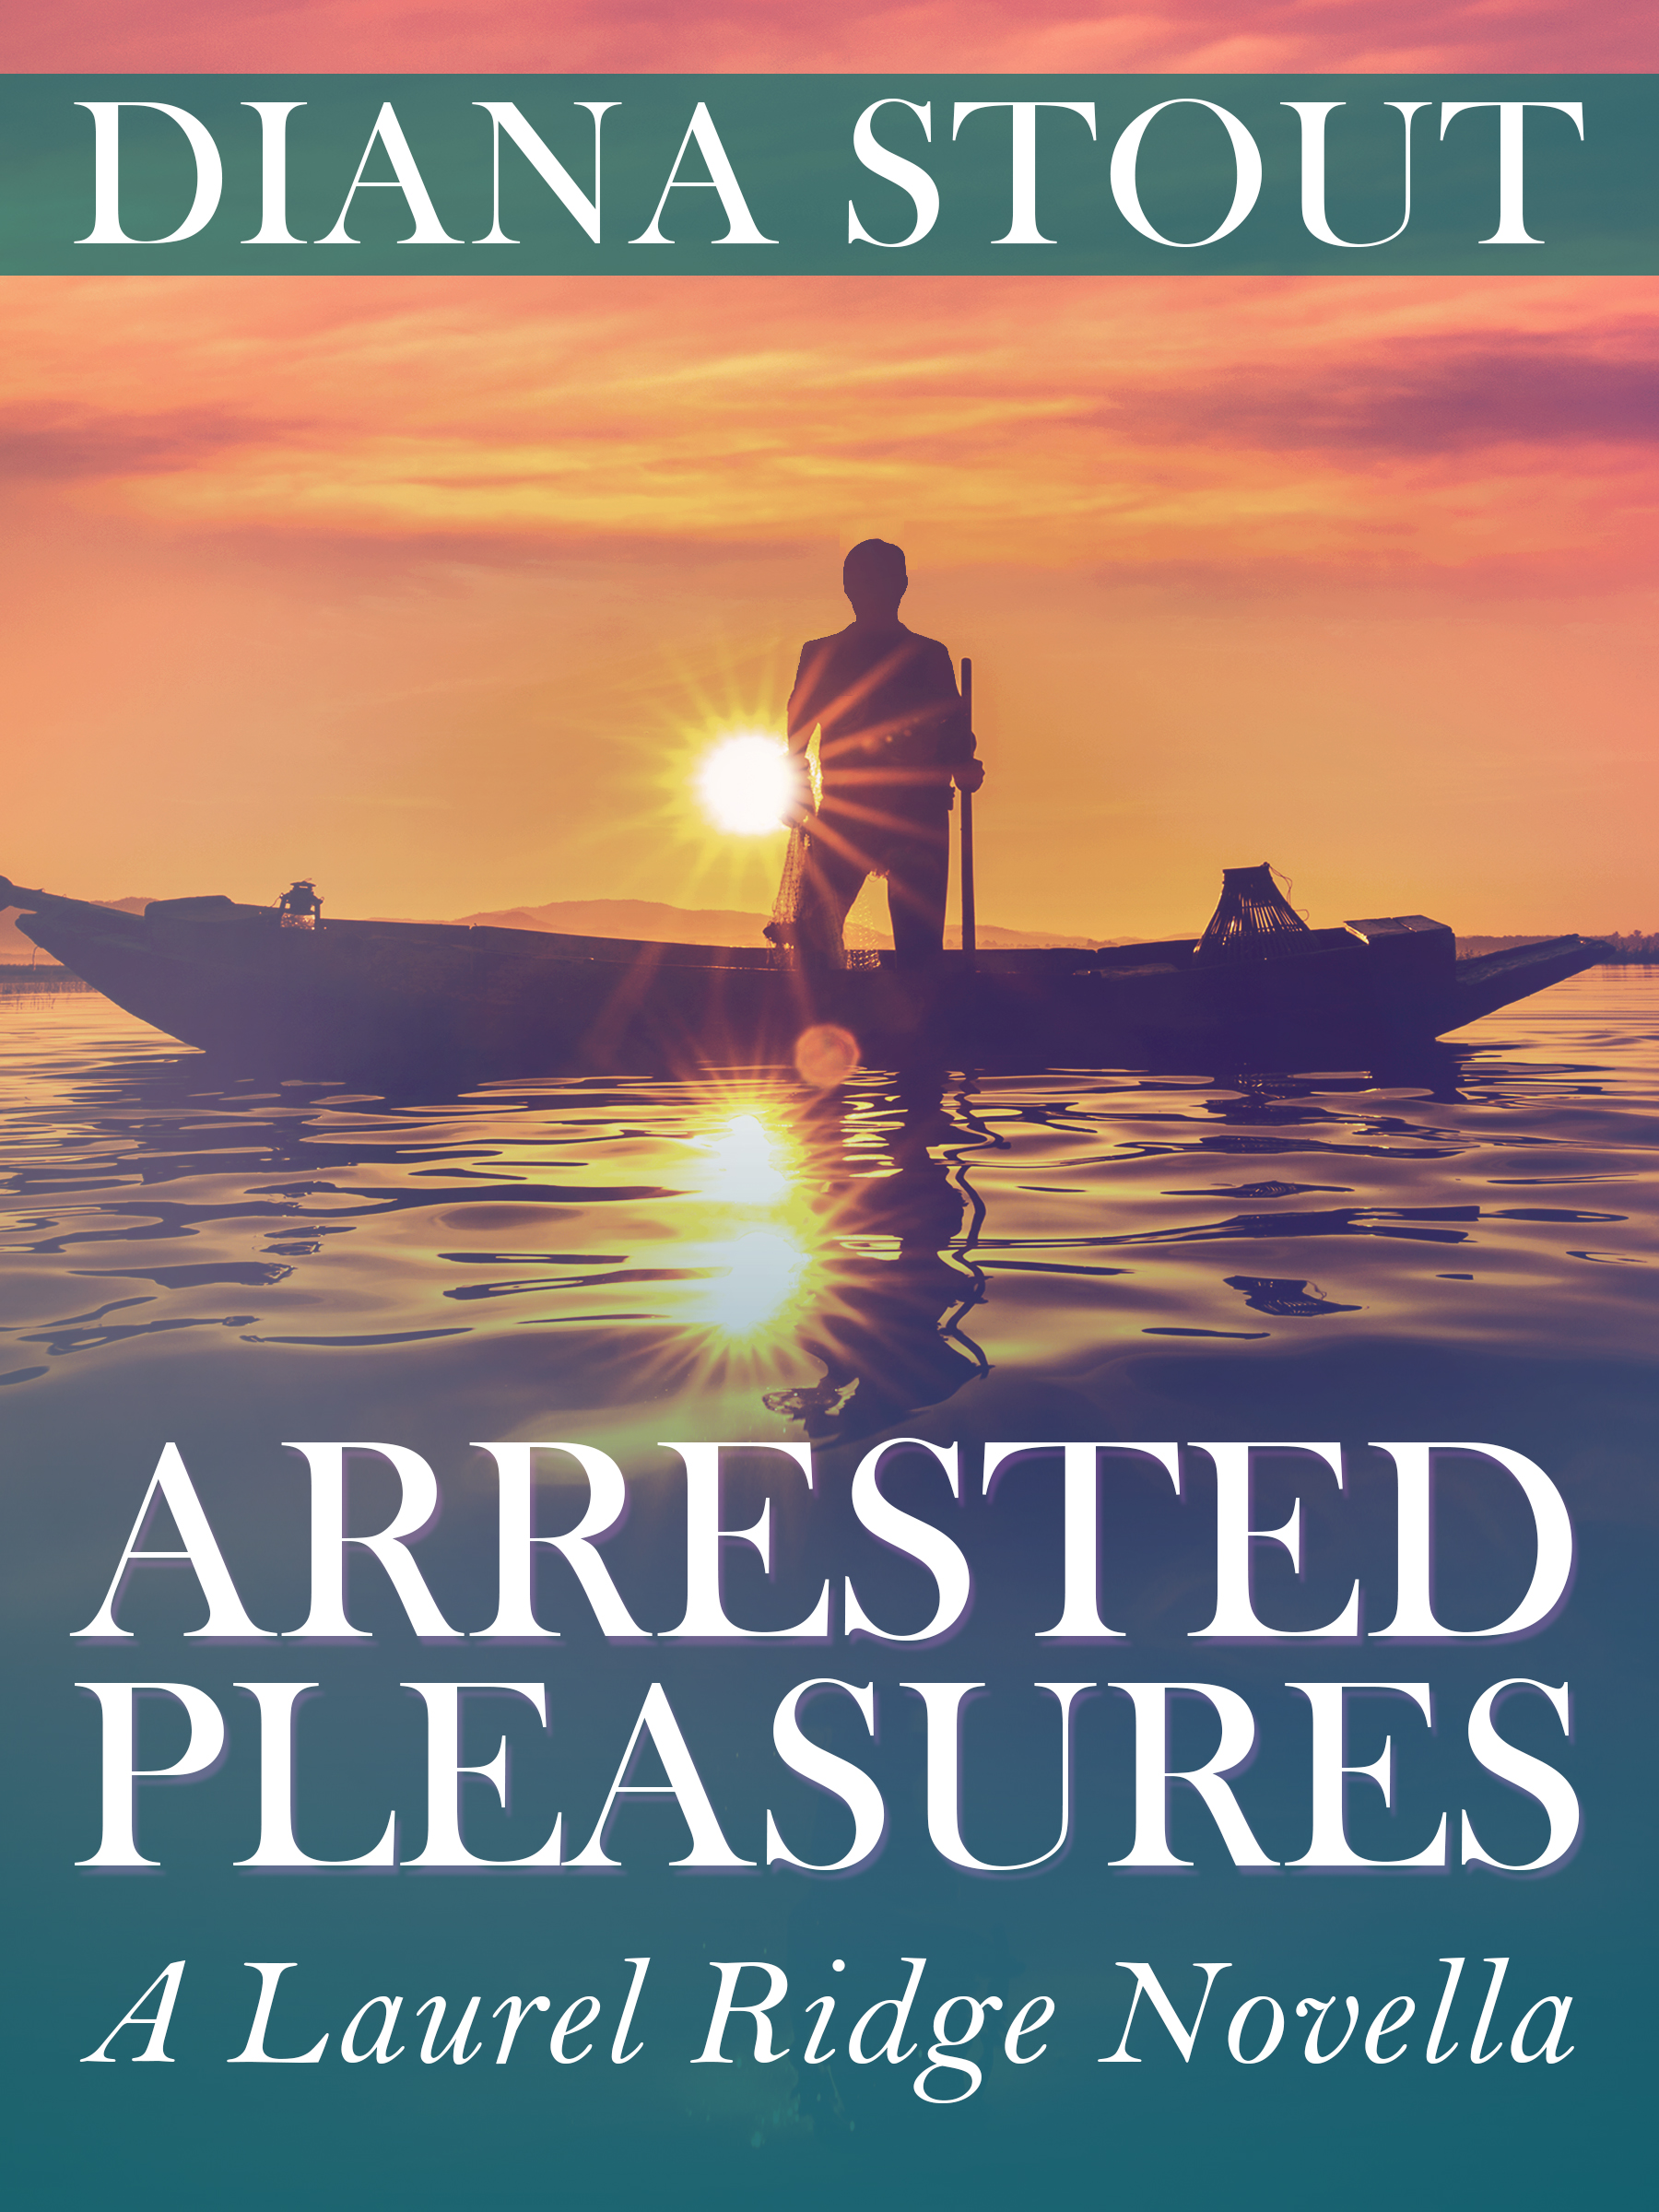 #Final #3 Arrested Pleasures - Final